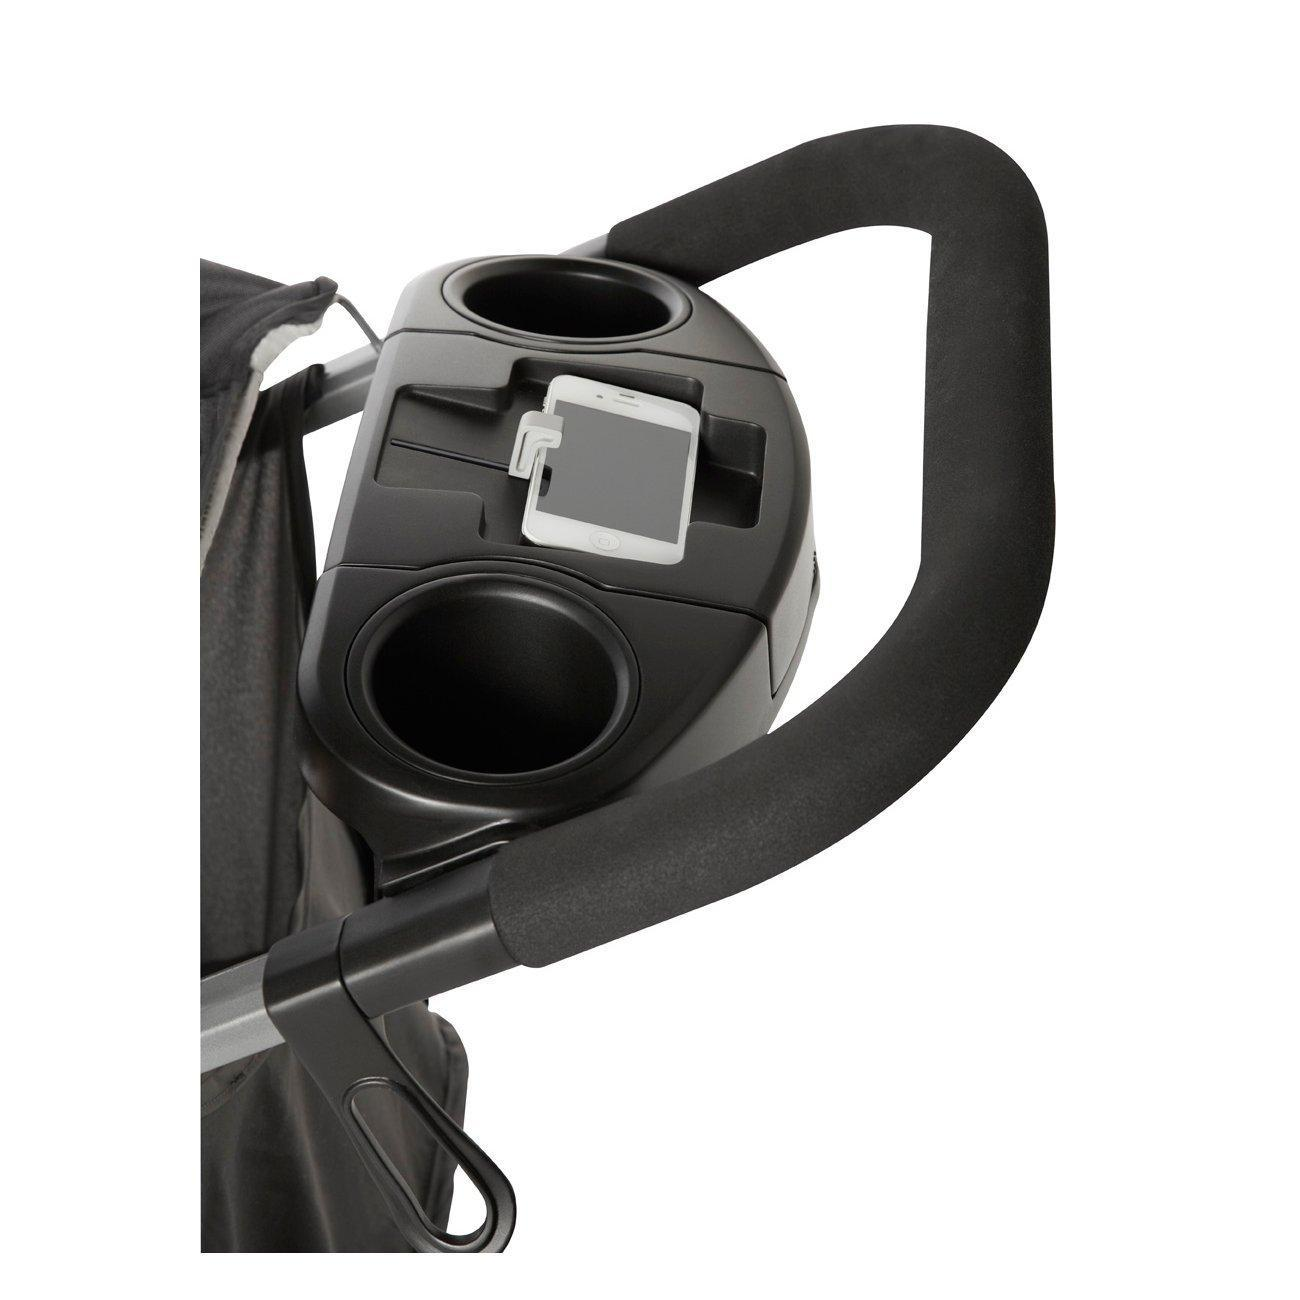 Amazon.com : Graco FastAction Fold Jogger Click Connect ...